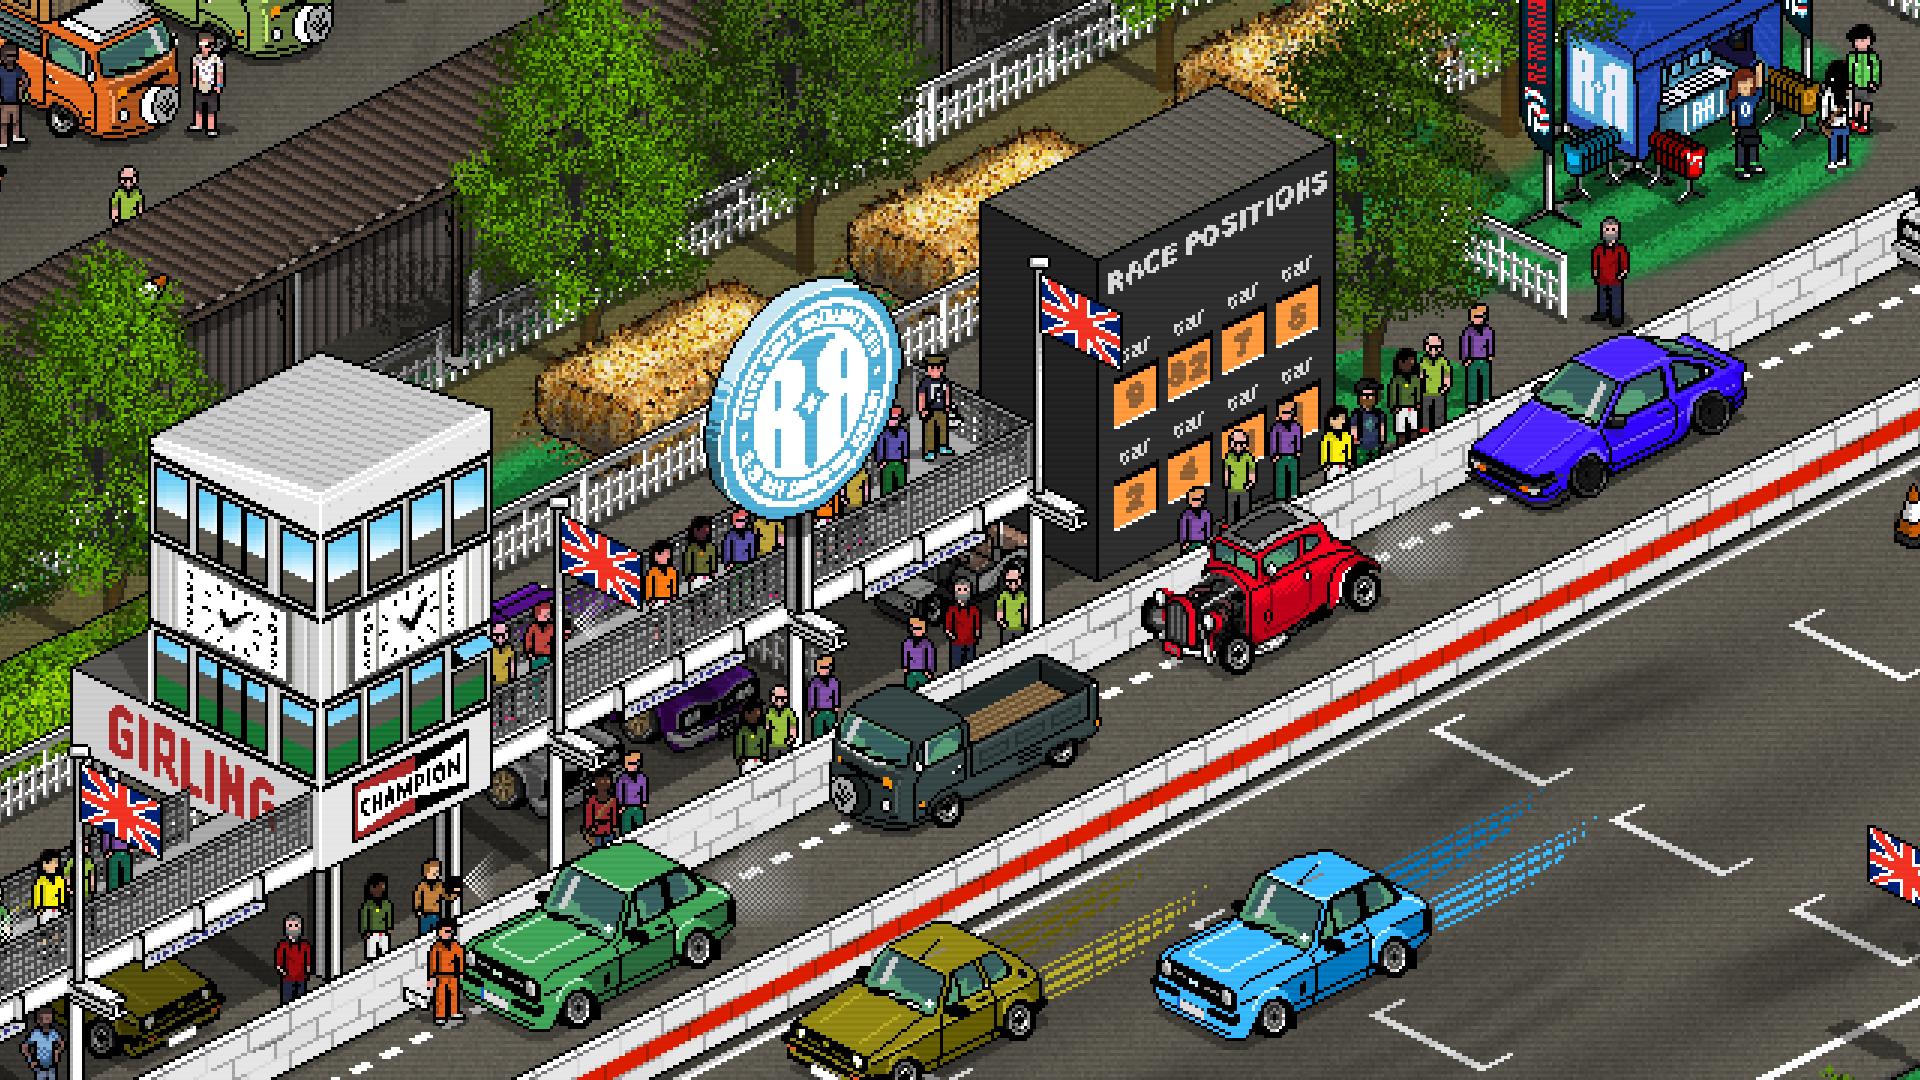 Vyxl Pixel Art for RRW2020 (+31 x Wallpapers for Desktop & Mobile)